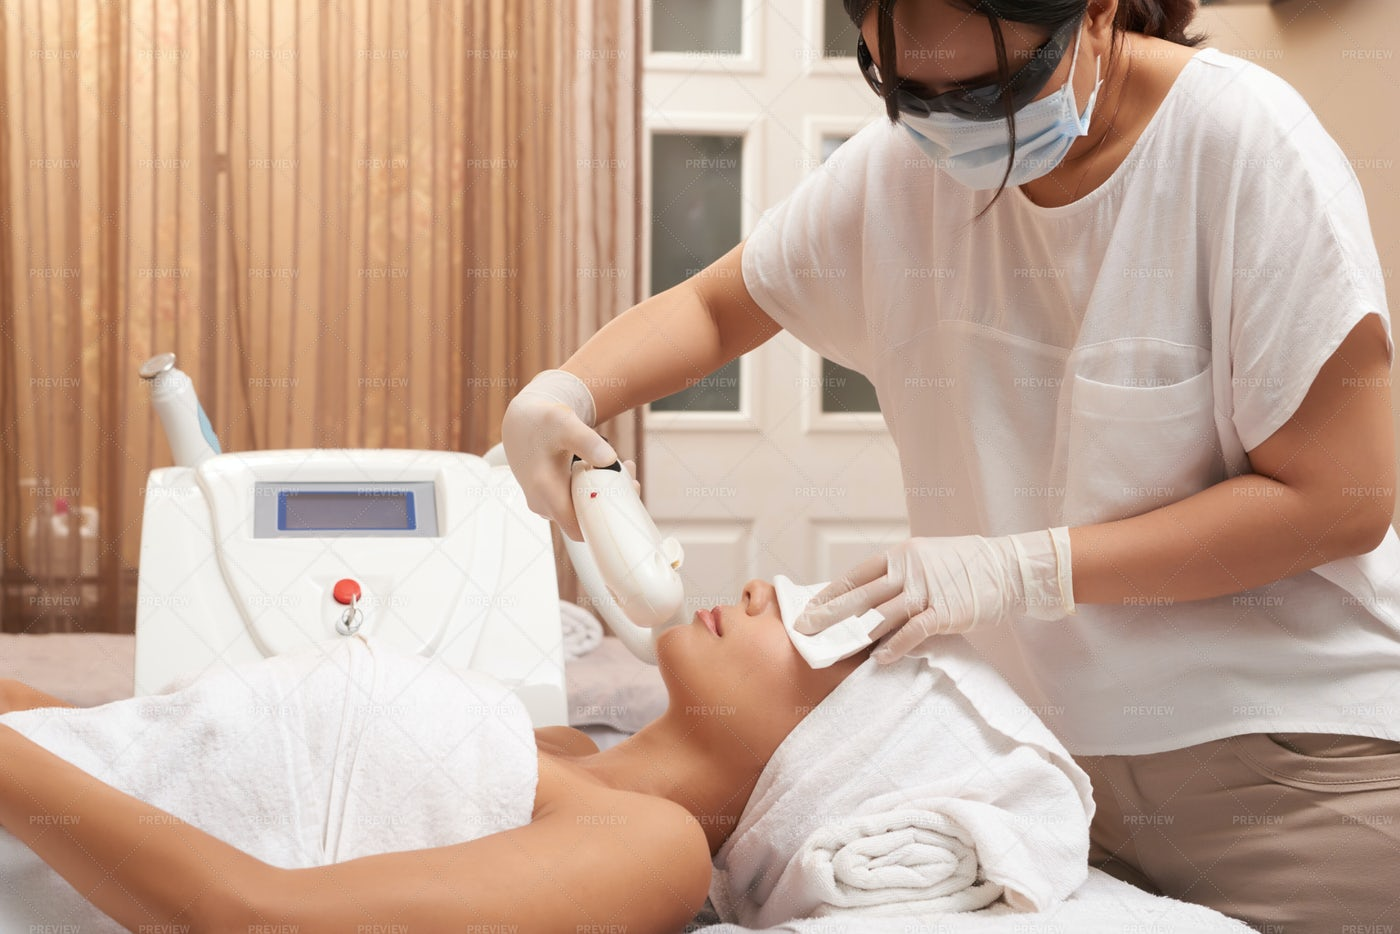 Ultrasound Procedure For Face In Salon: Stock Photos